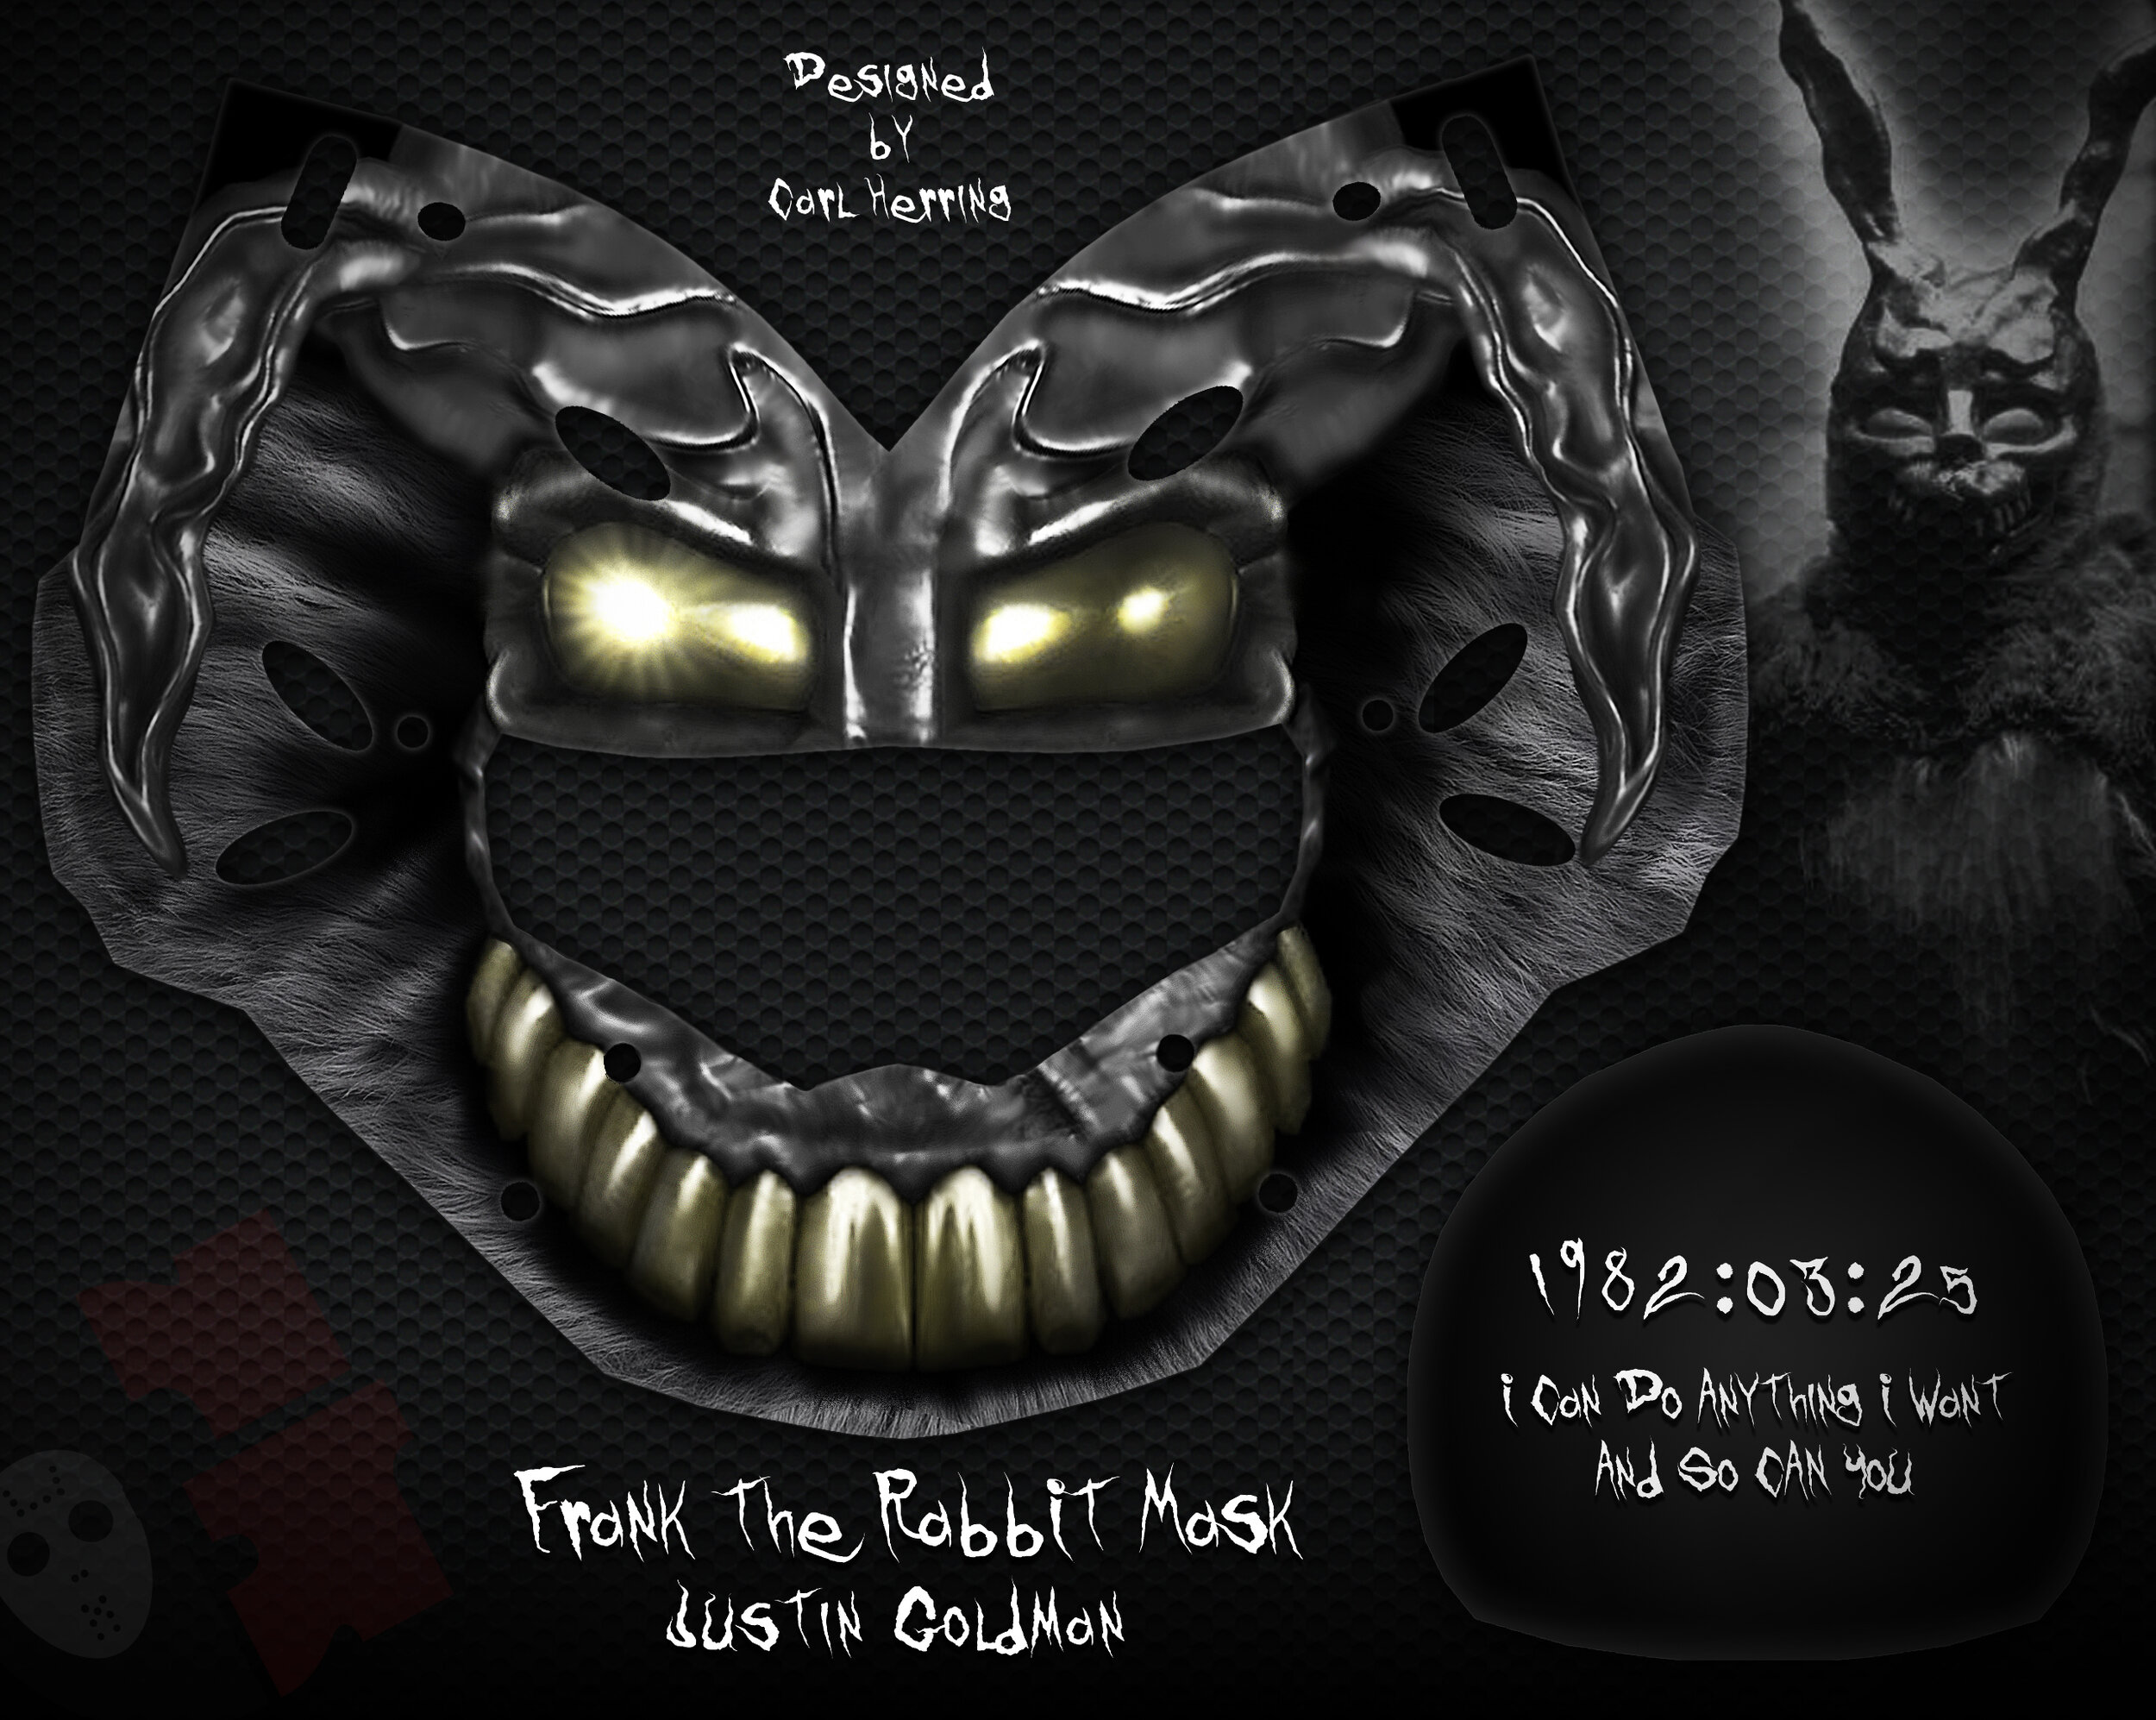 Justin Goldman Frank The Rabbit Mask Design